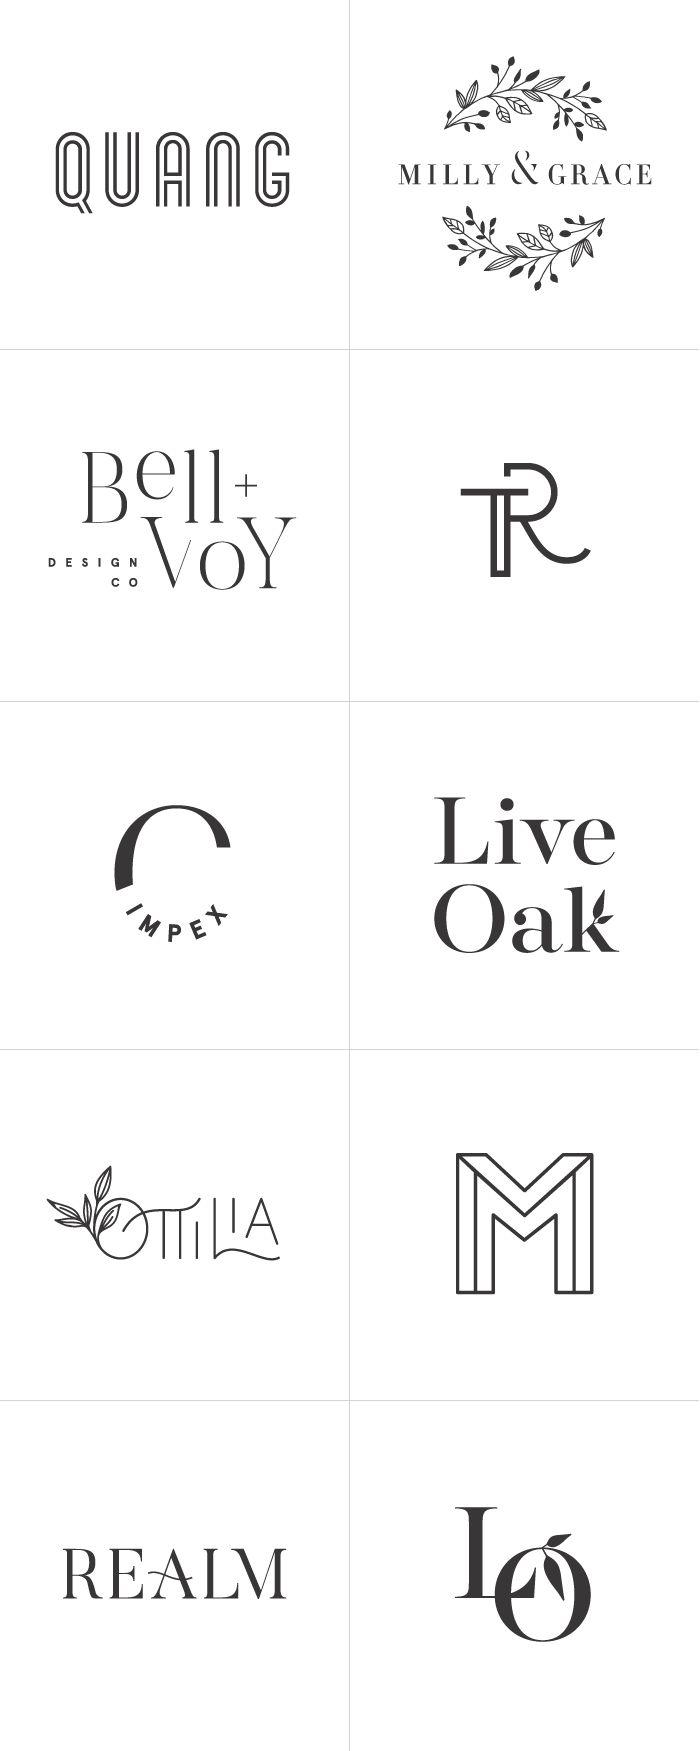 Rowan Made   2017 Logos